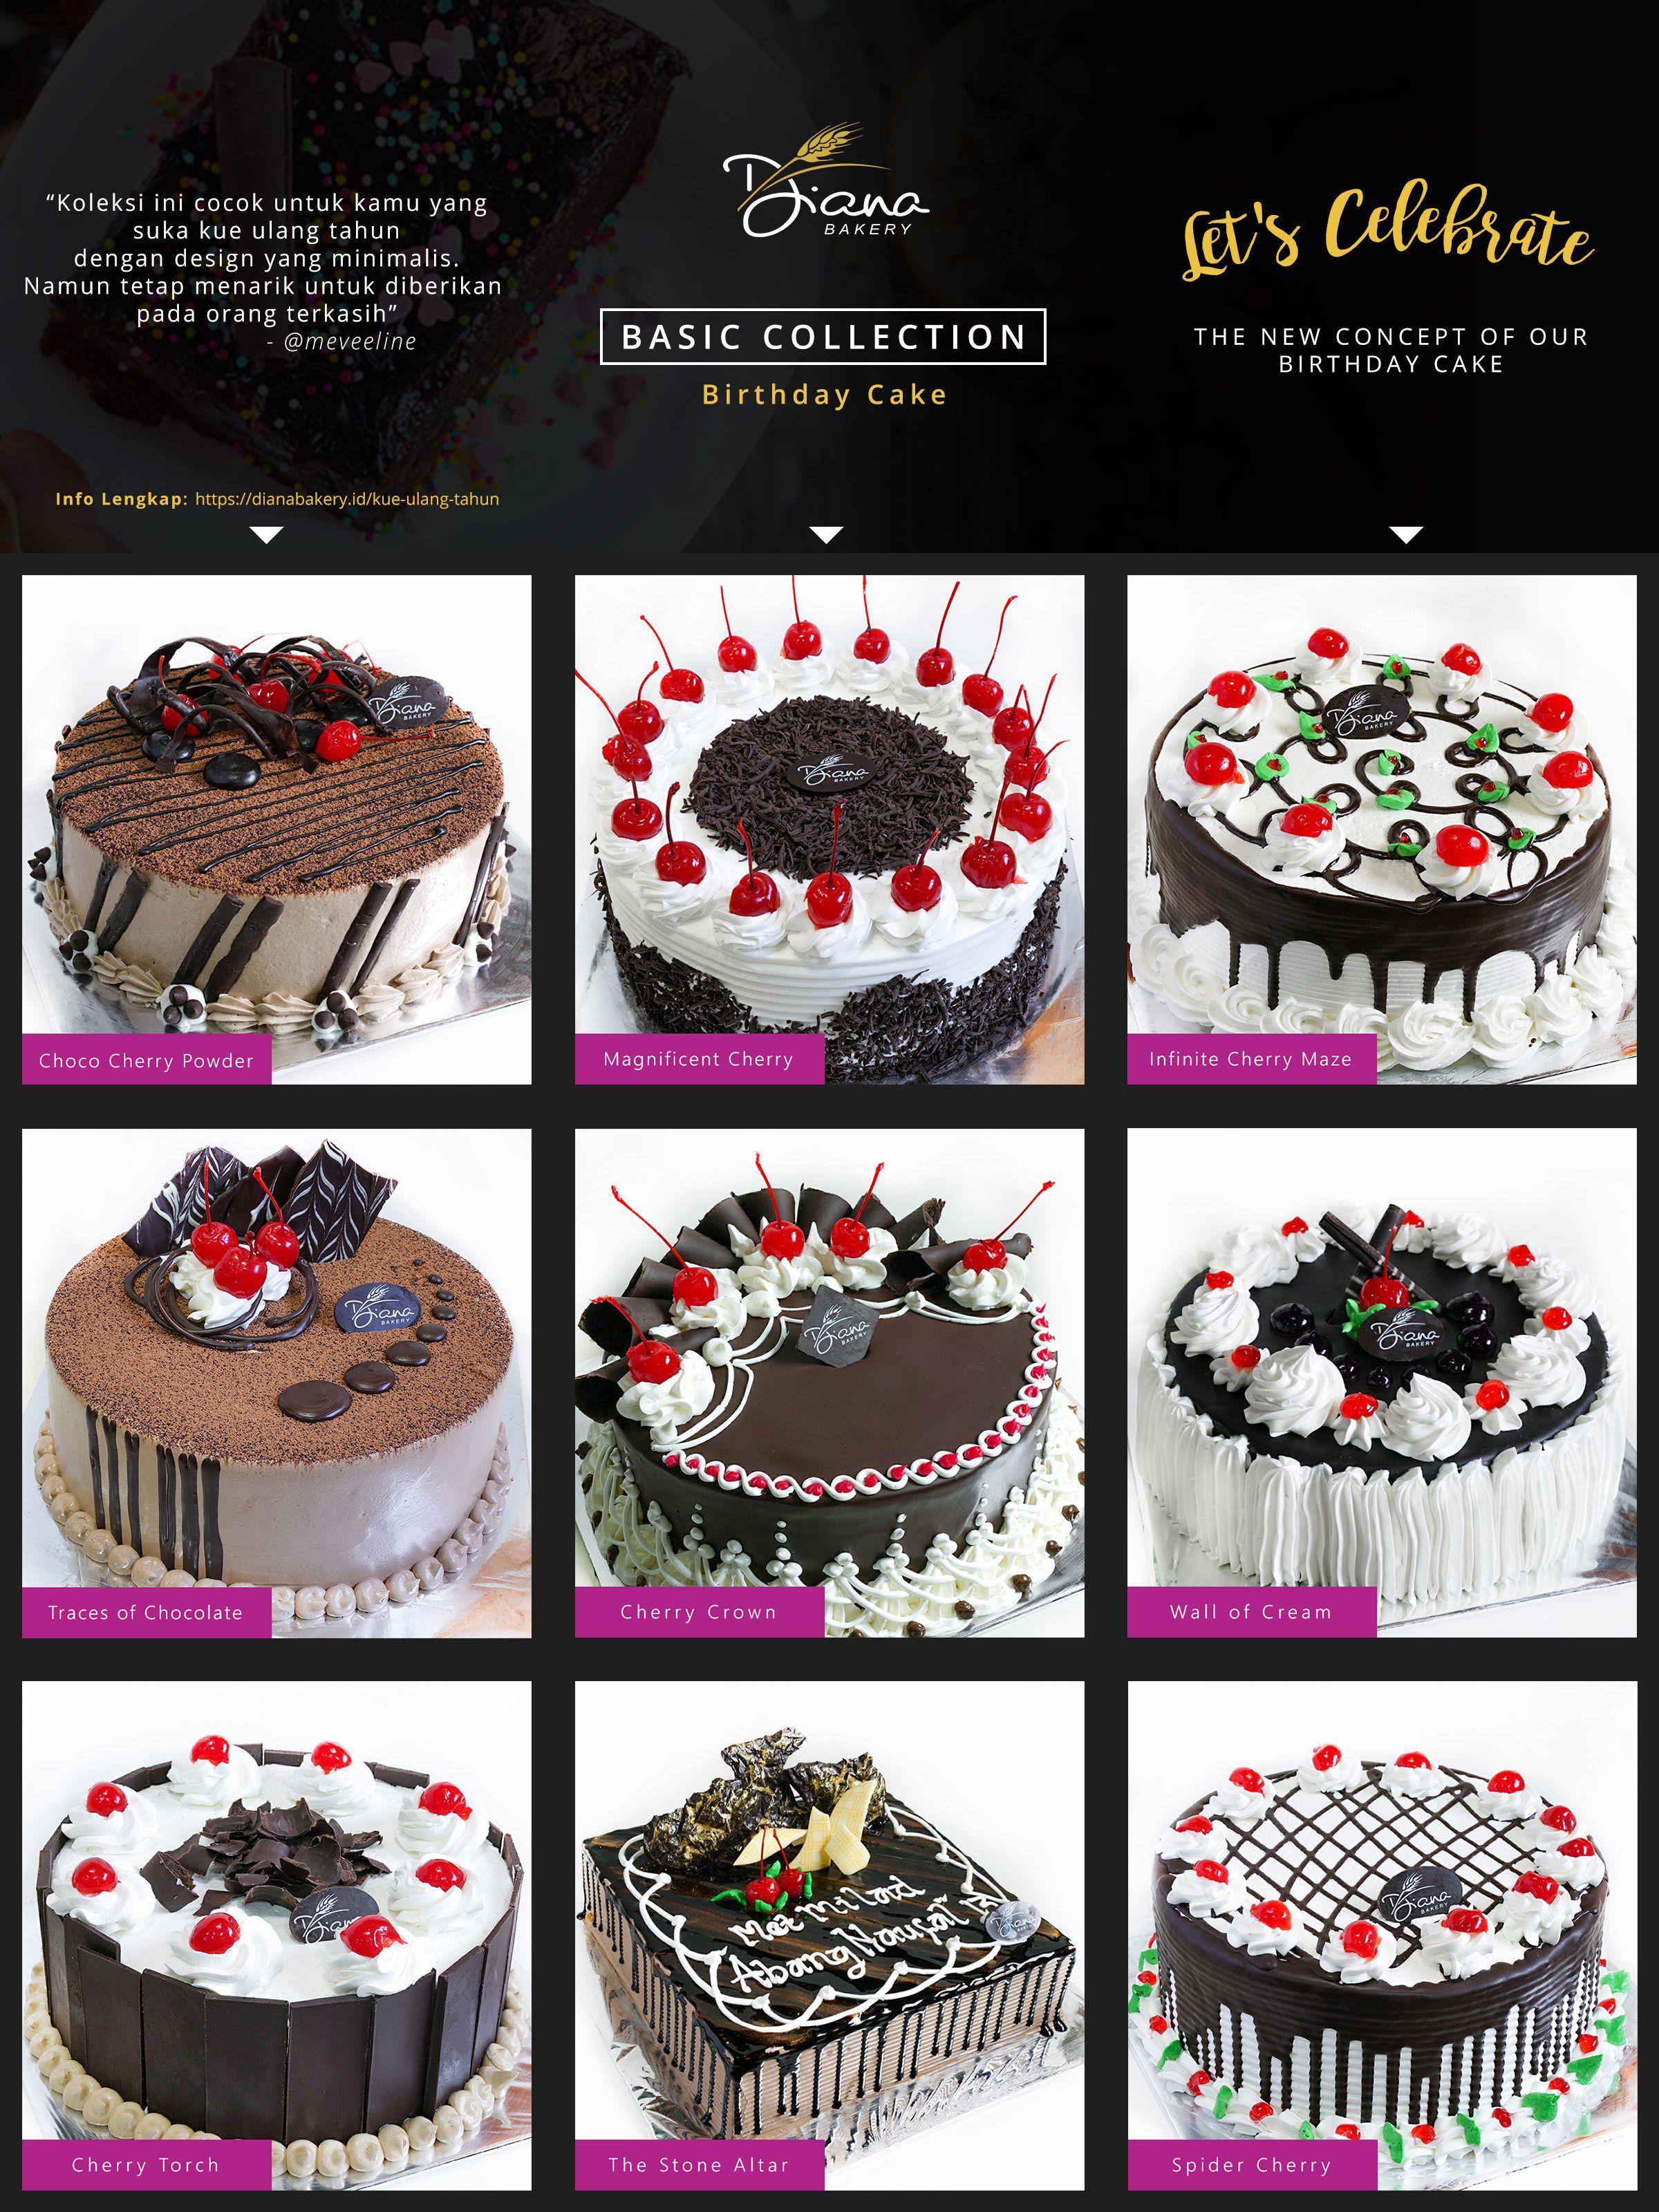 7 Gambar Koleksi Kue Ulang Tahun Jakarta Bekasi Terbaik